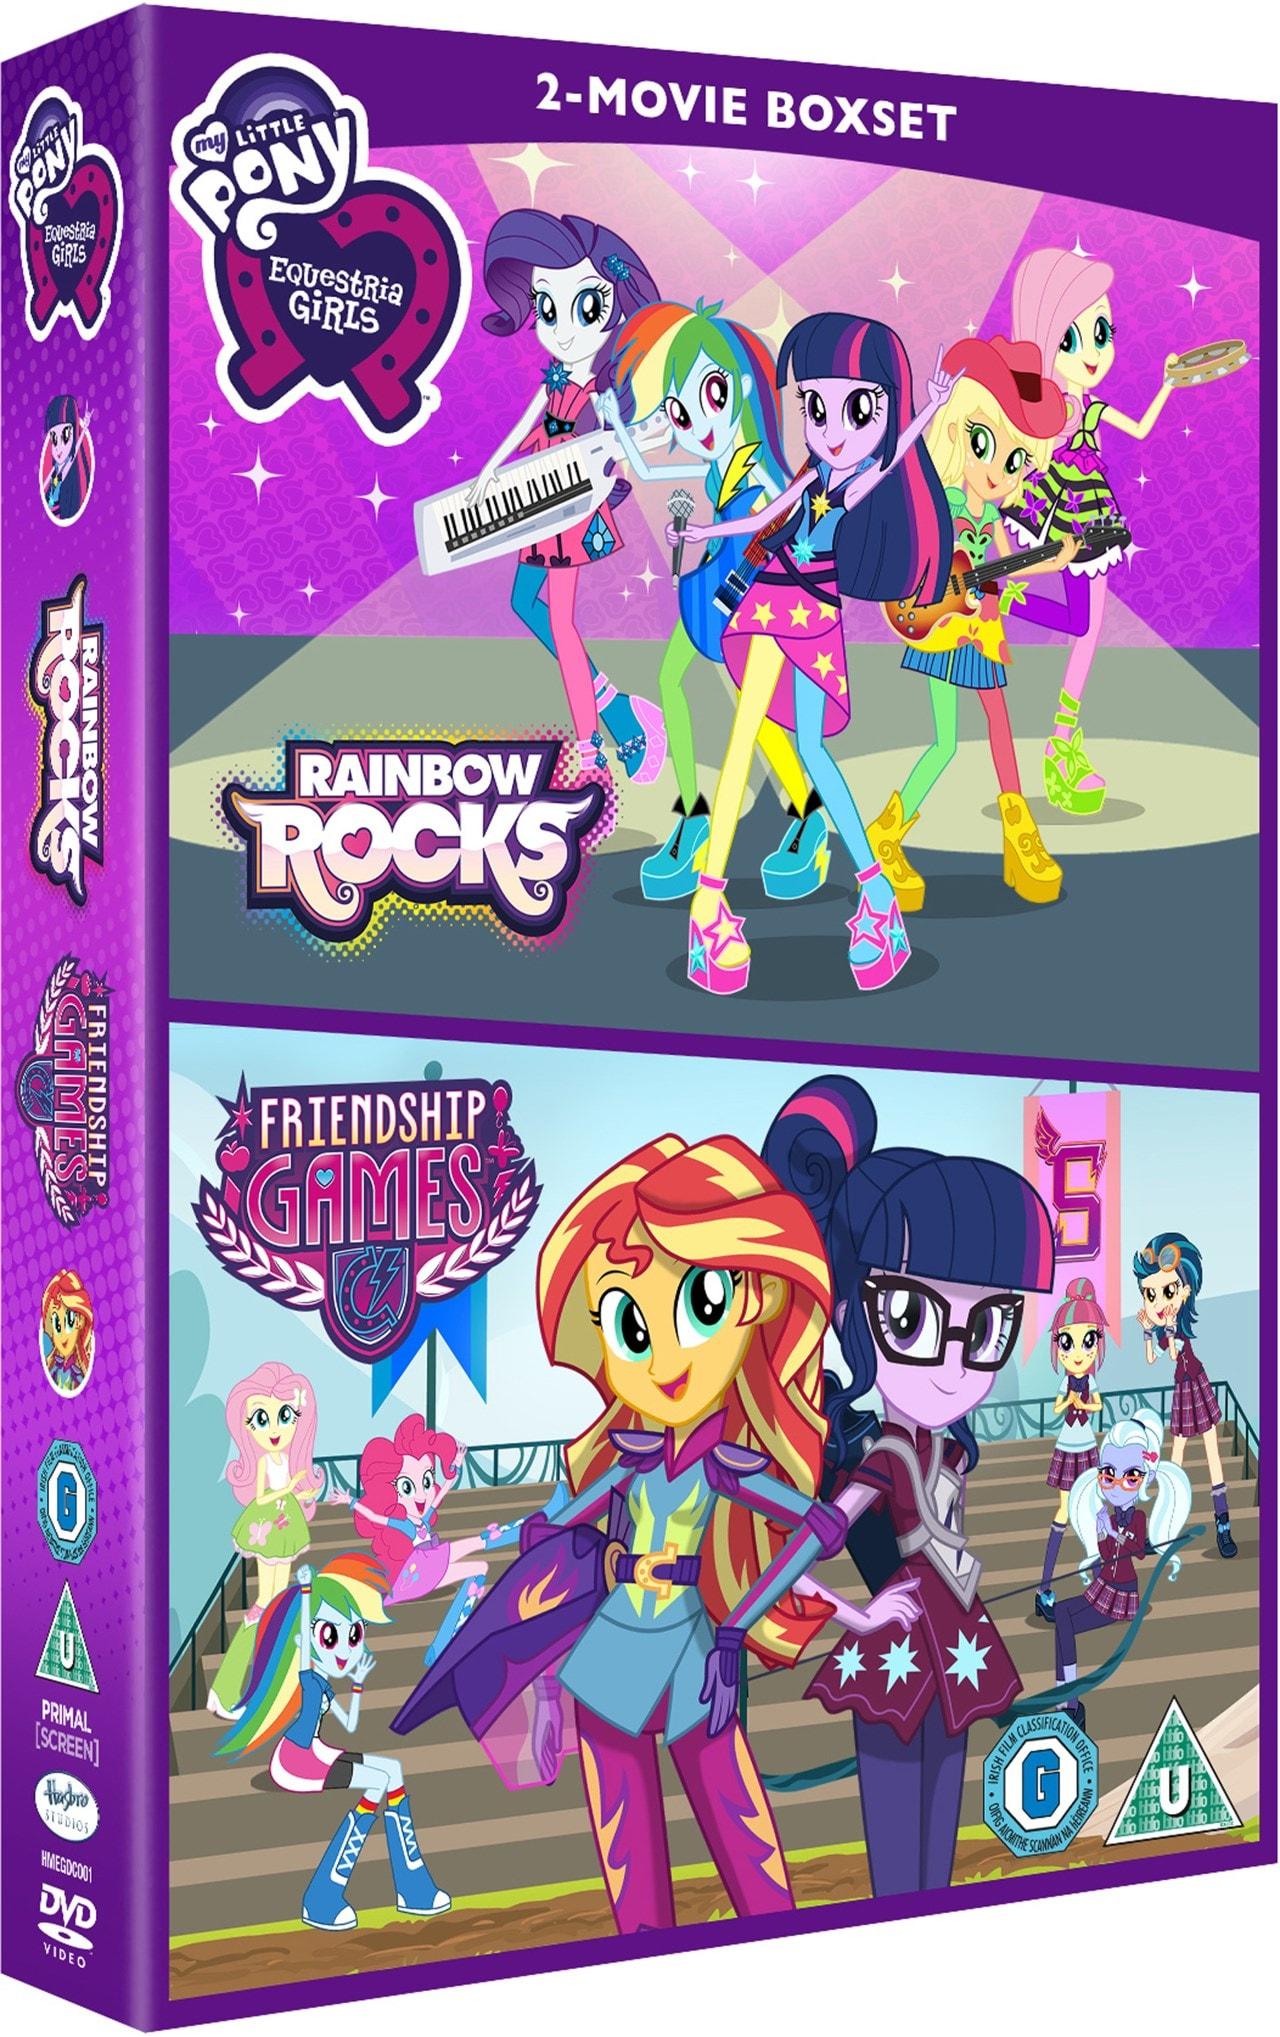 My Little Pony Equestria Girls Rainbow Rocks Friendship Games Dvd Box Set Free Shipping Over 20 Hmv Store